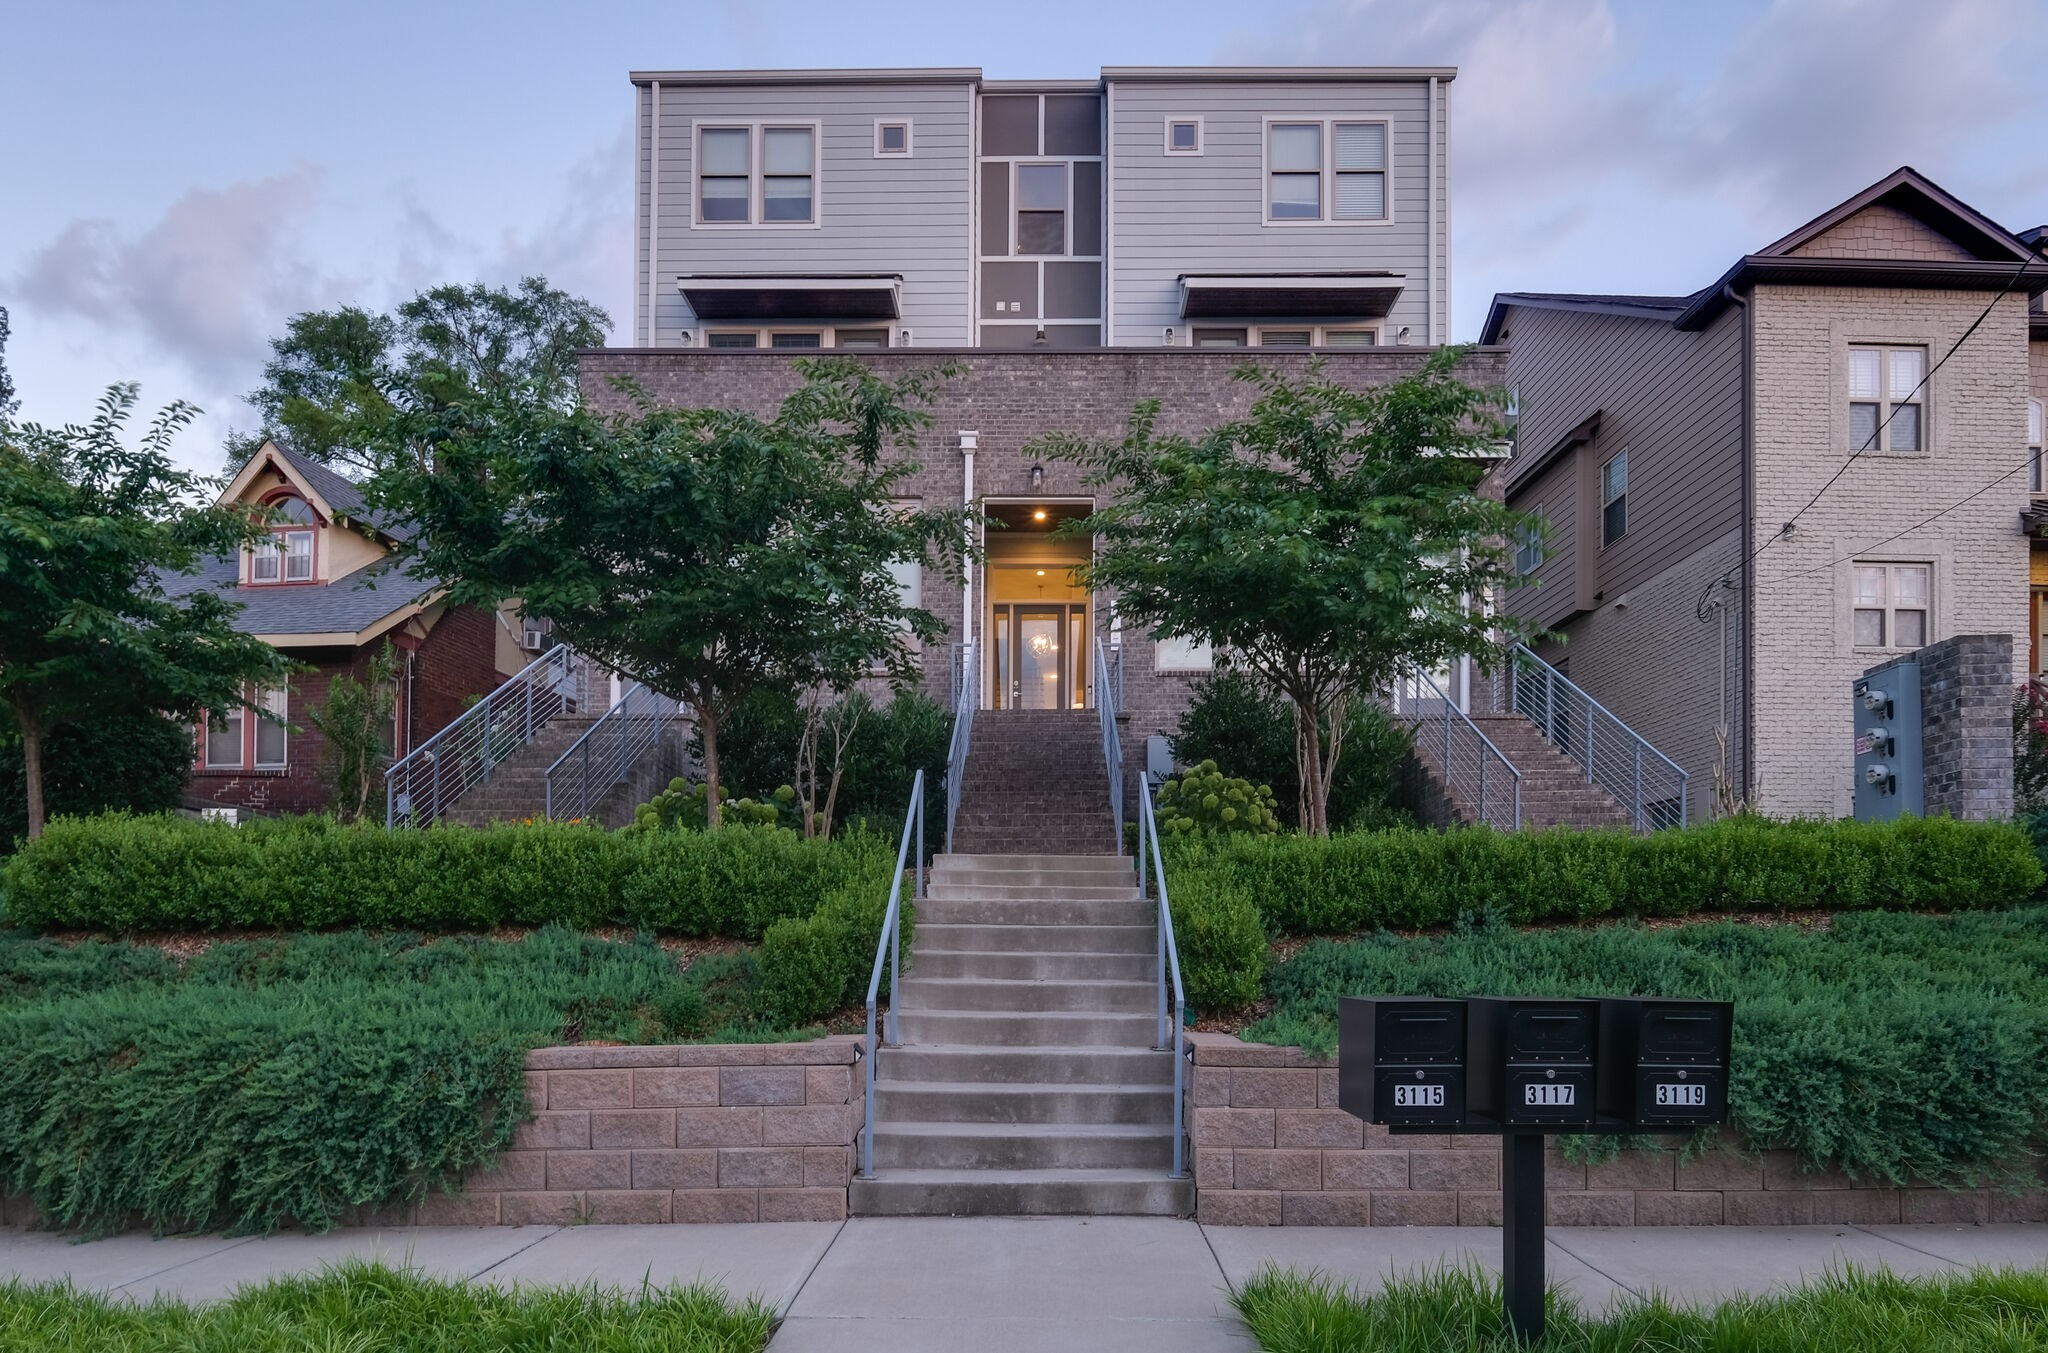 3117 Belwood St Property Photo - Nashville, TN real estate listing